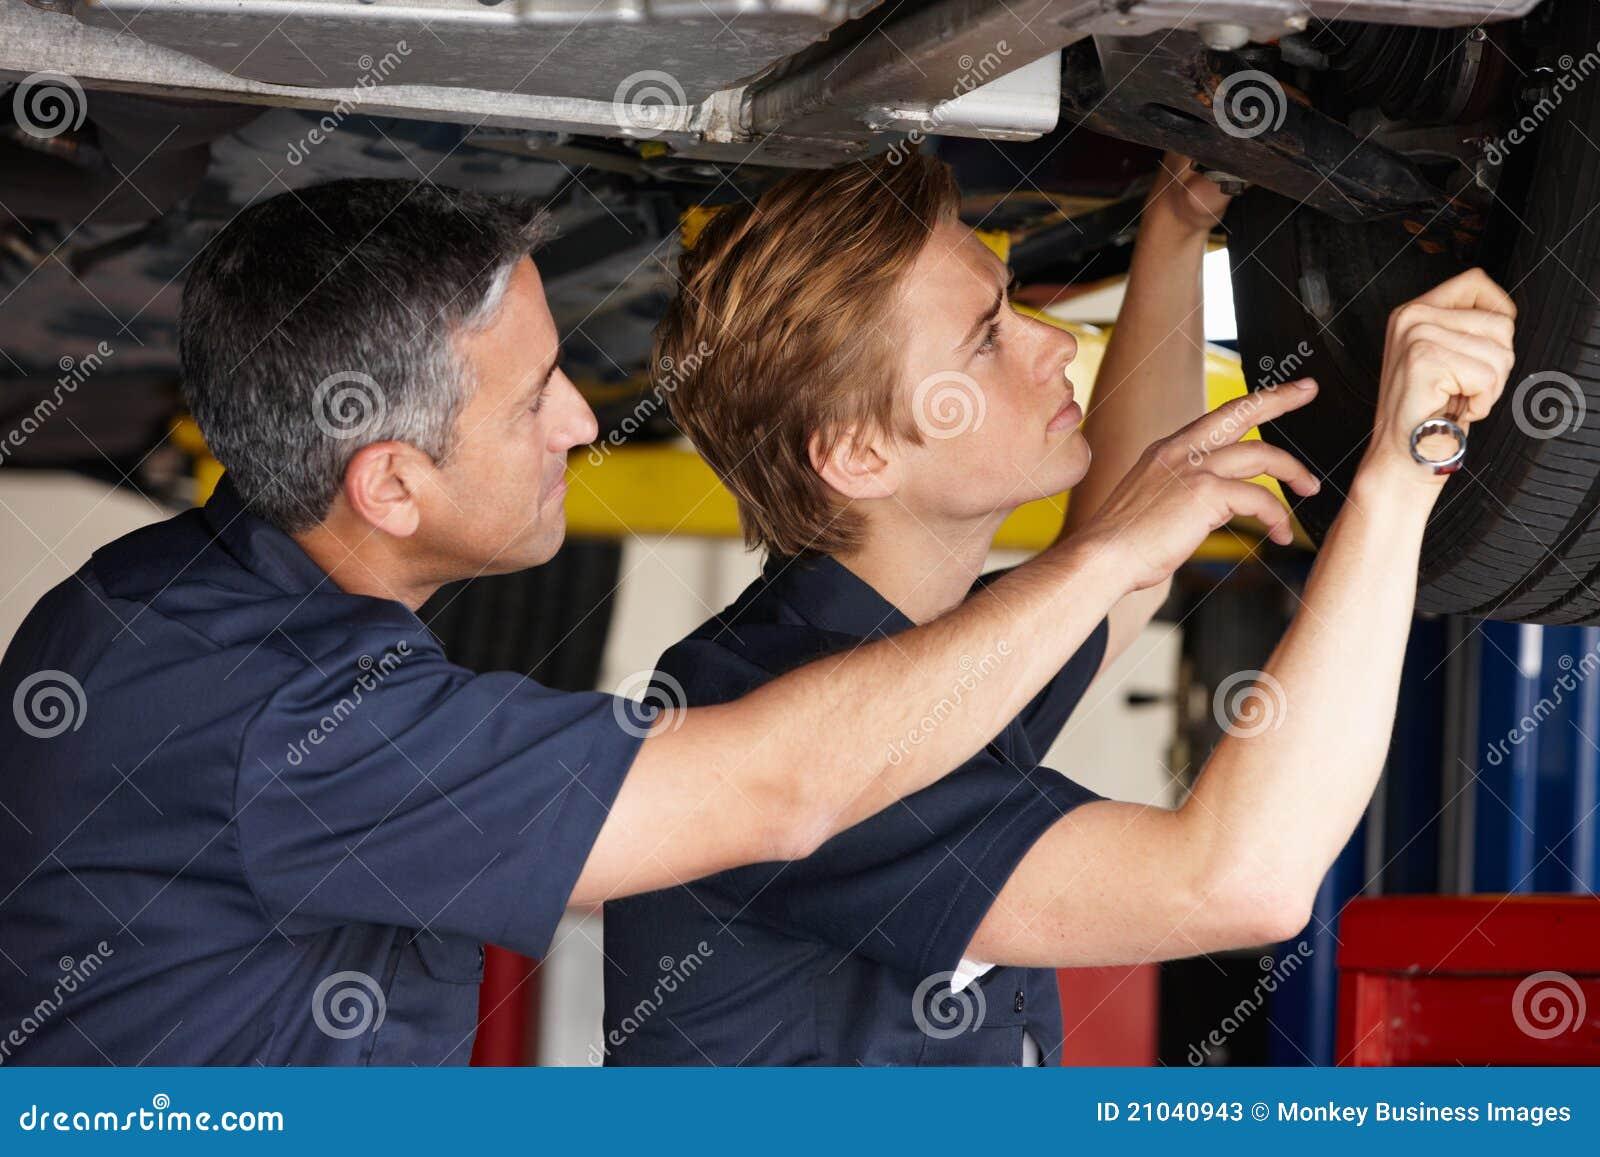 Mechanics At Work Stock Image Image Of Mechanic Adult